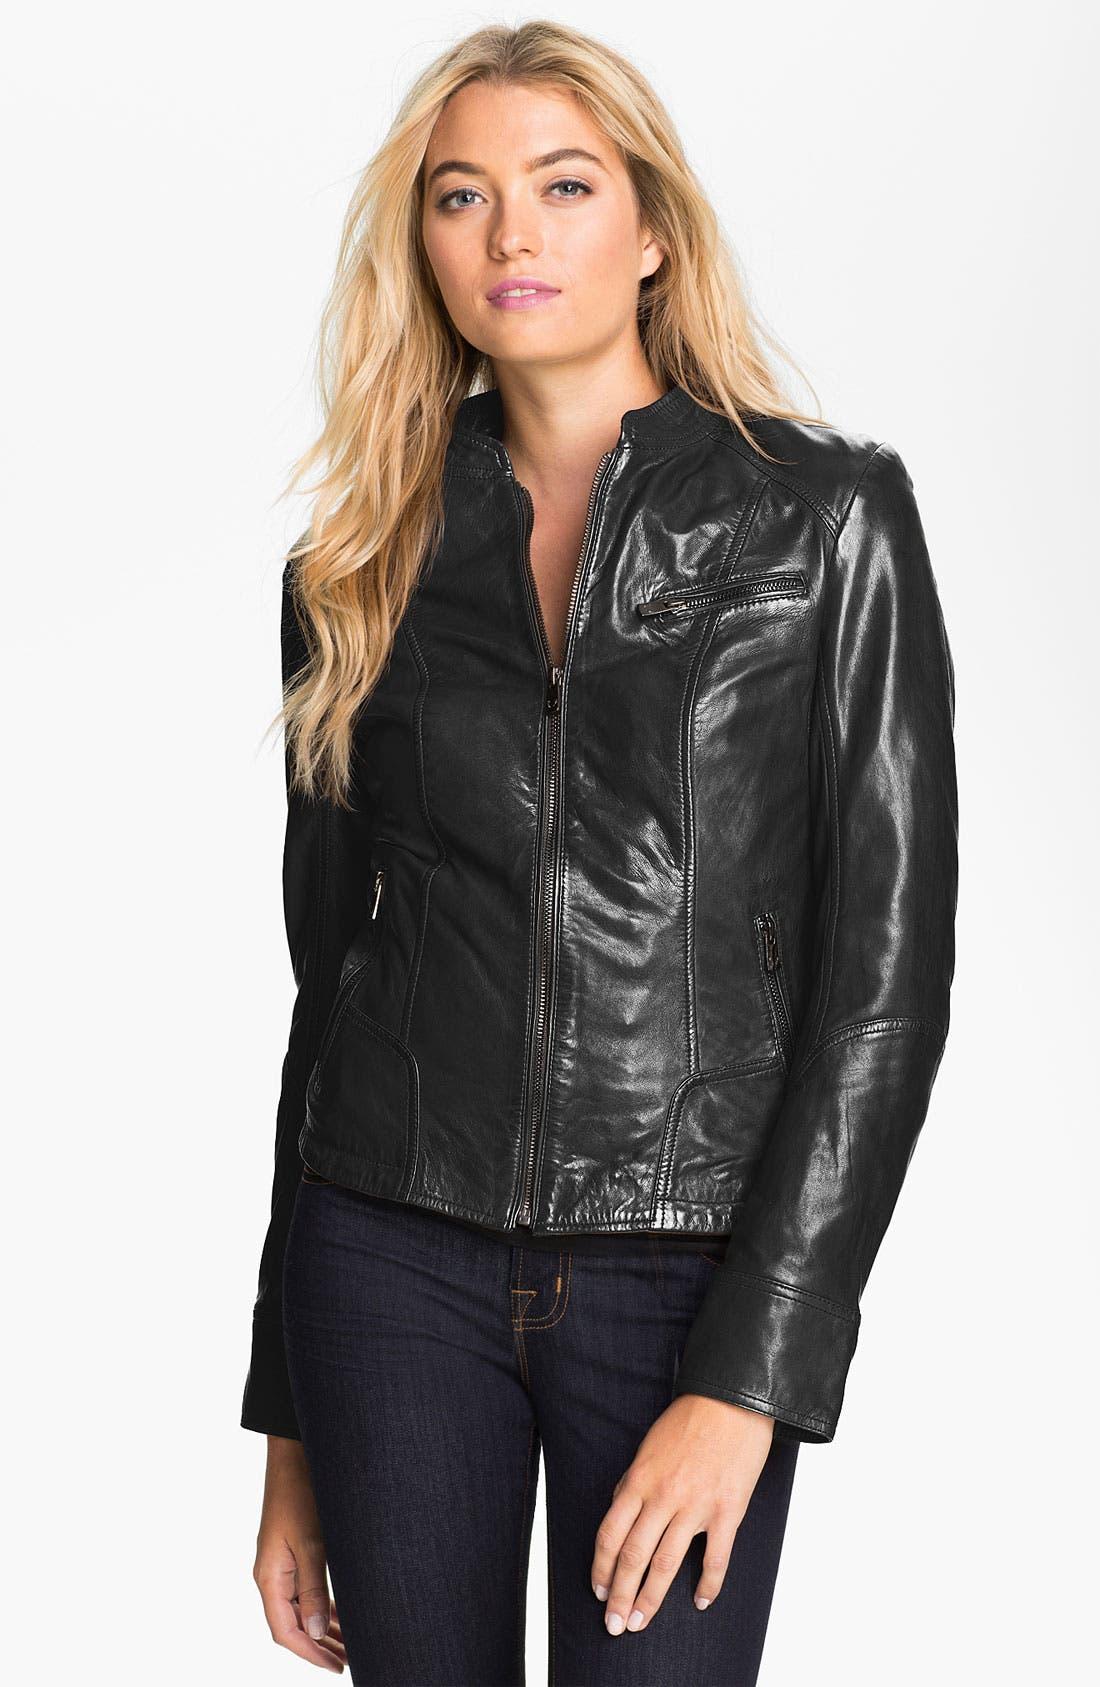 Main Image - Bod & Christensen Leather Jacket